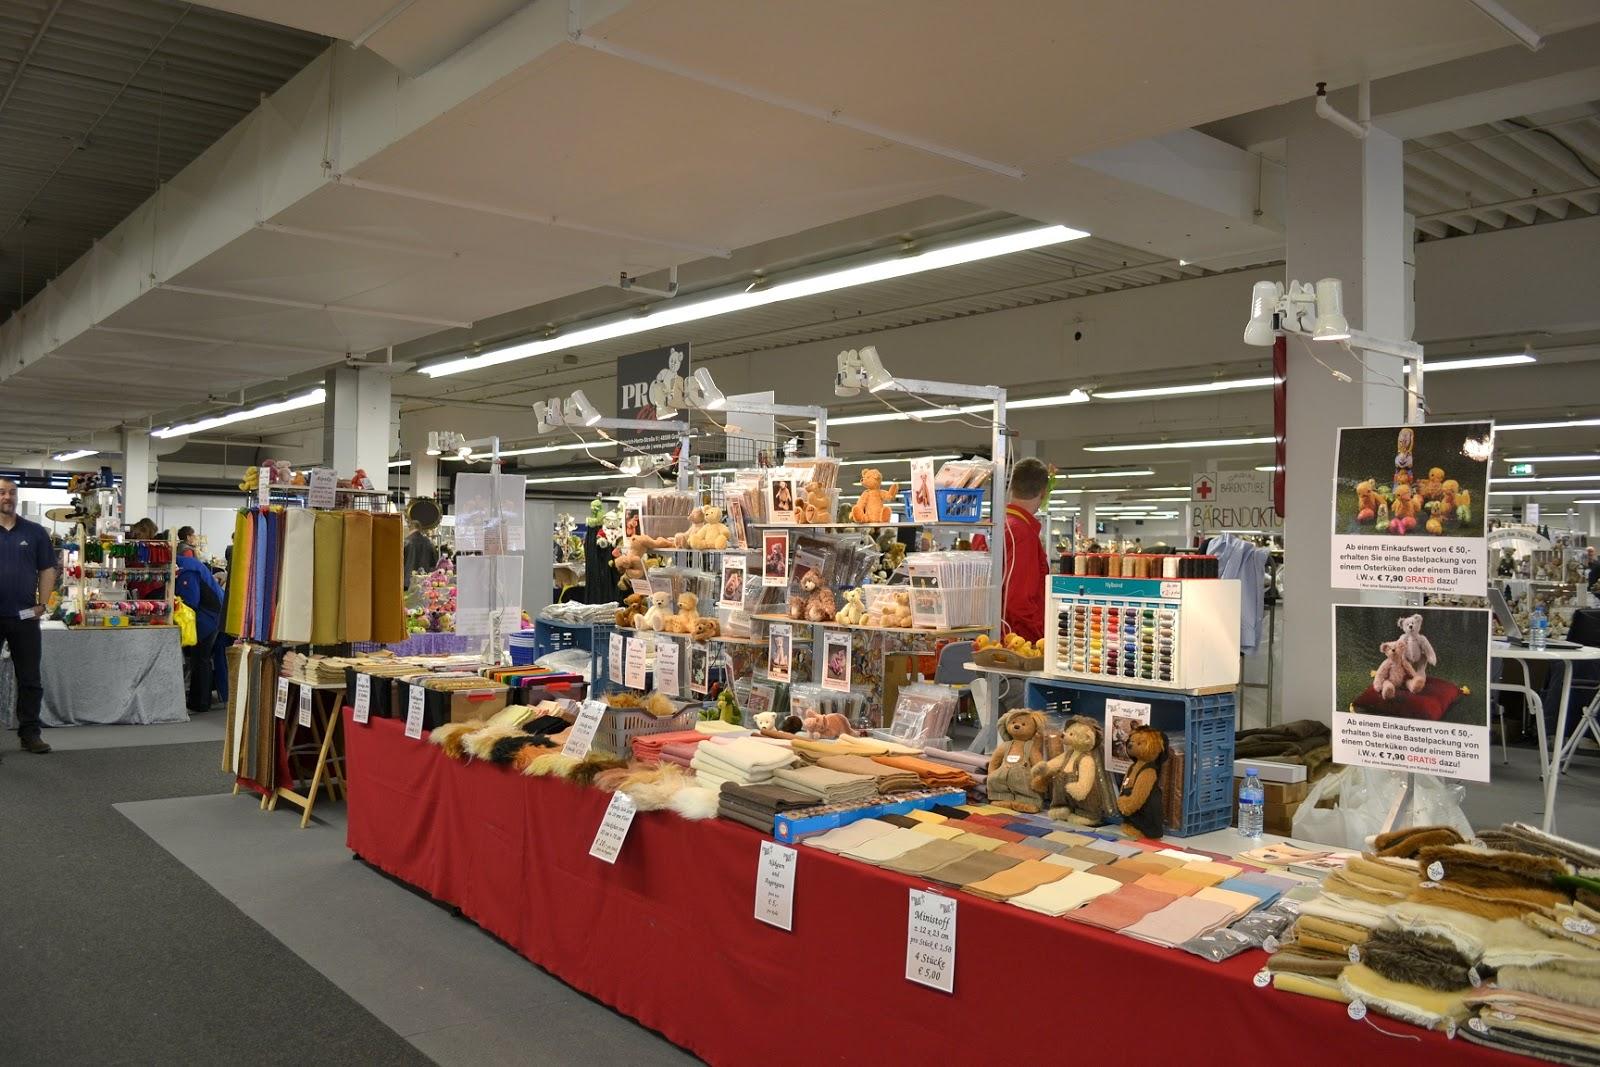 Выставка мишек тедди 2015 в Германии, Висбаден, Teddy Ausstellung Teddybär Welt 2015 Wiesbaden/Wallau